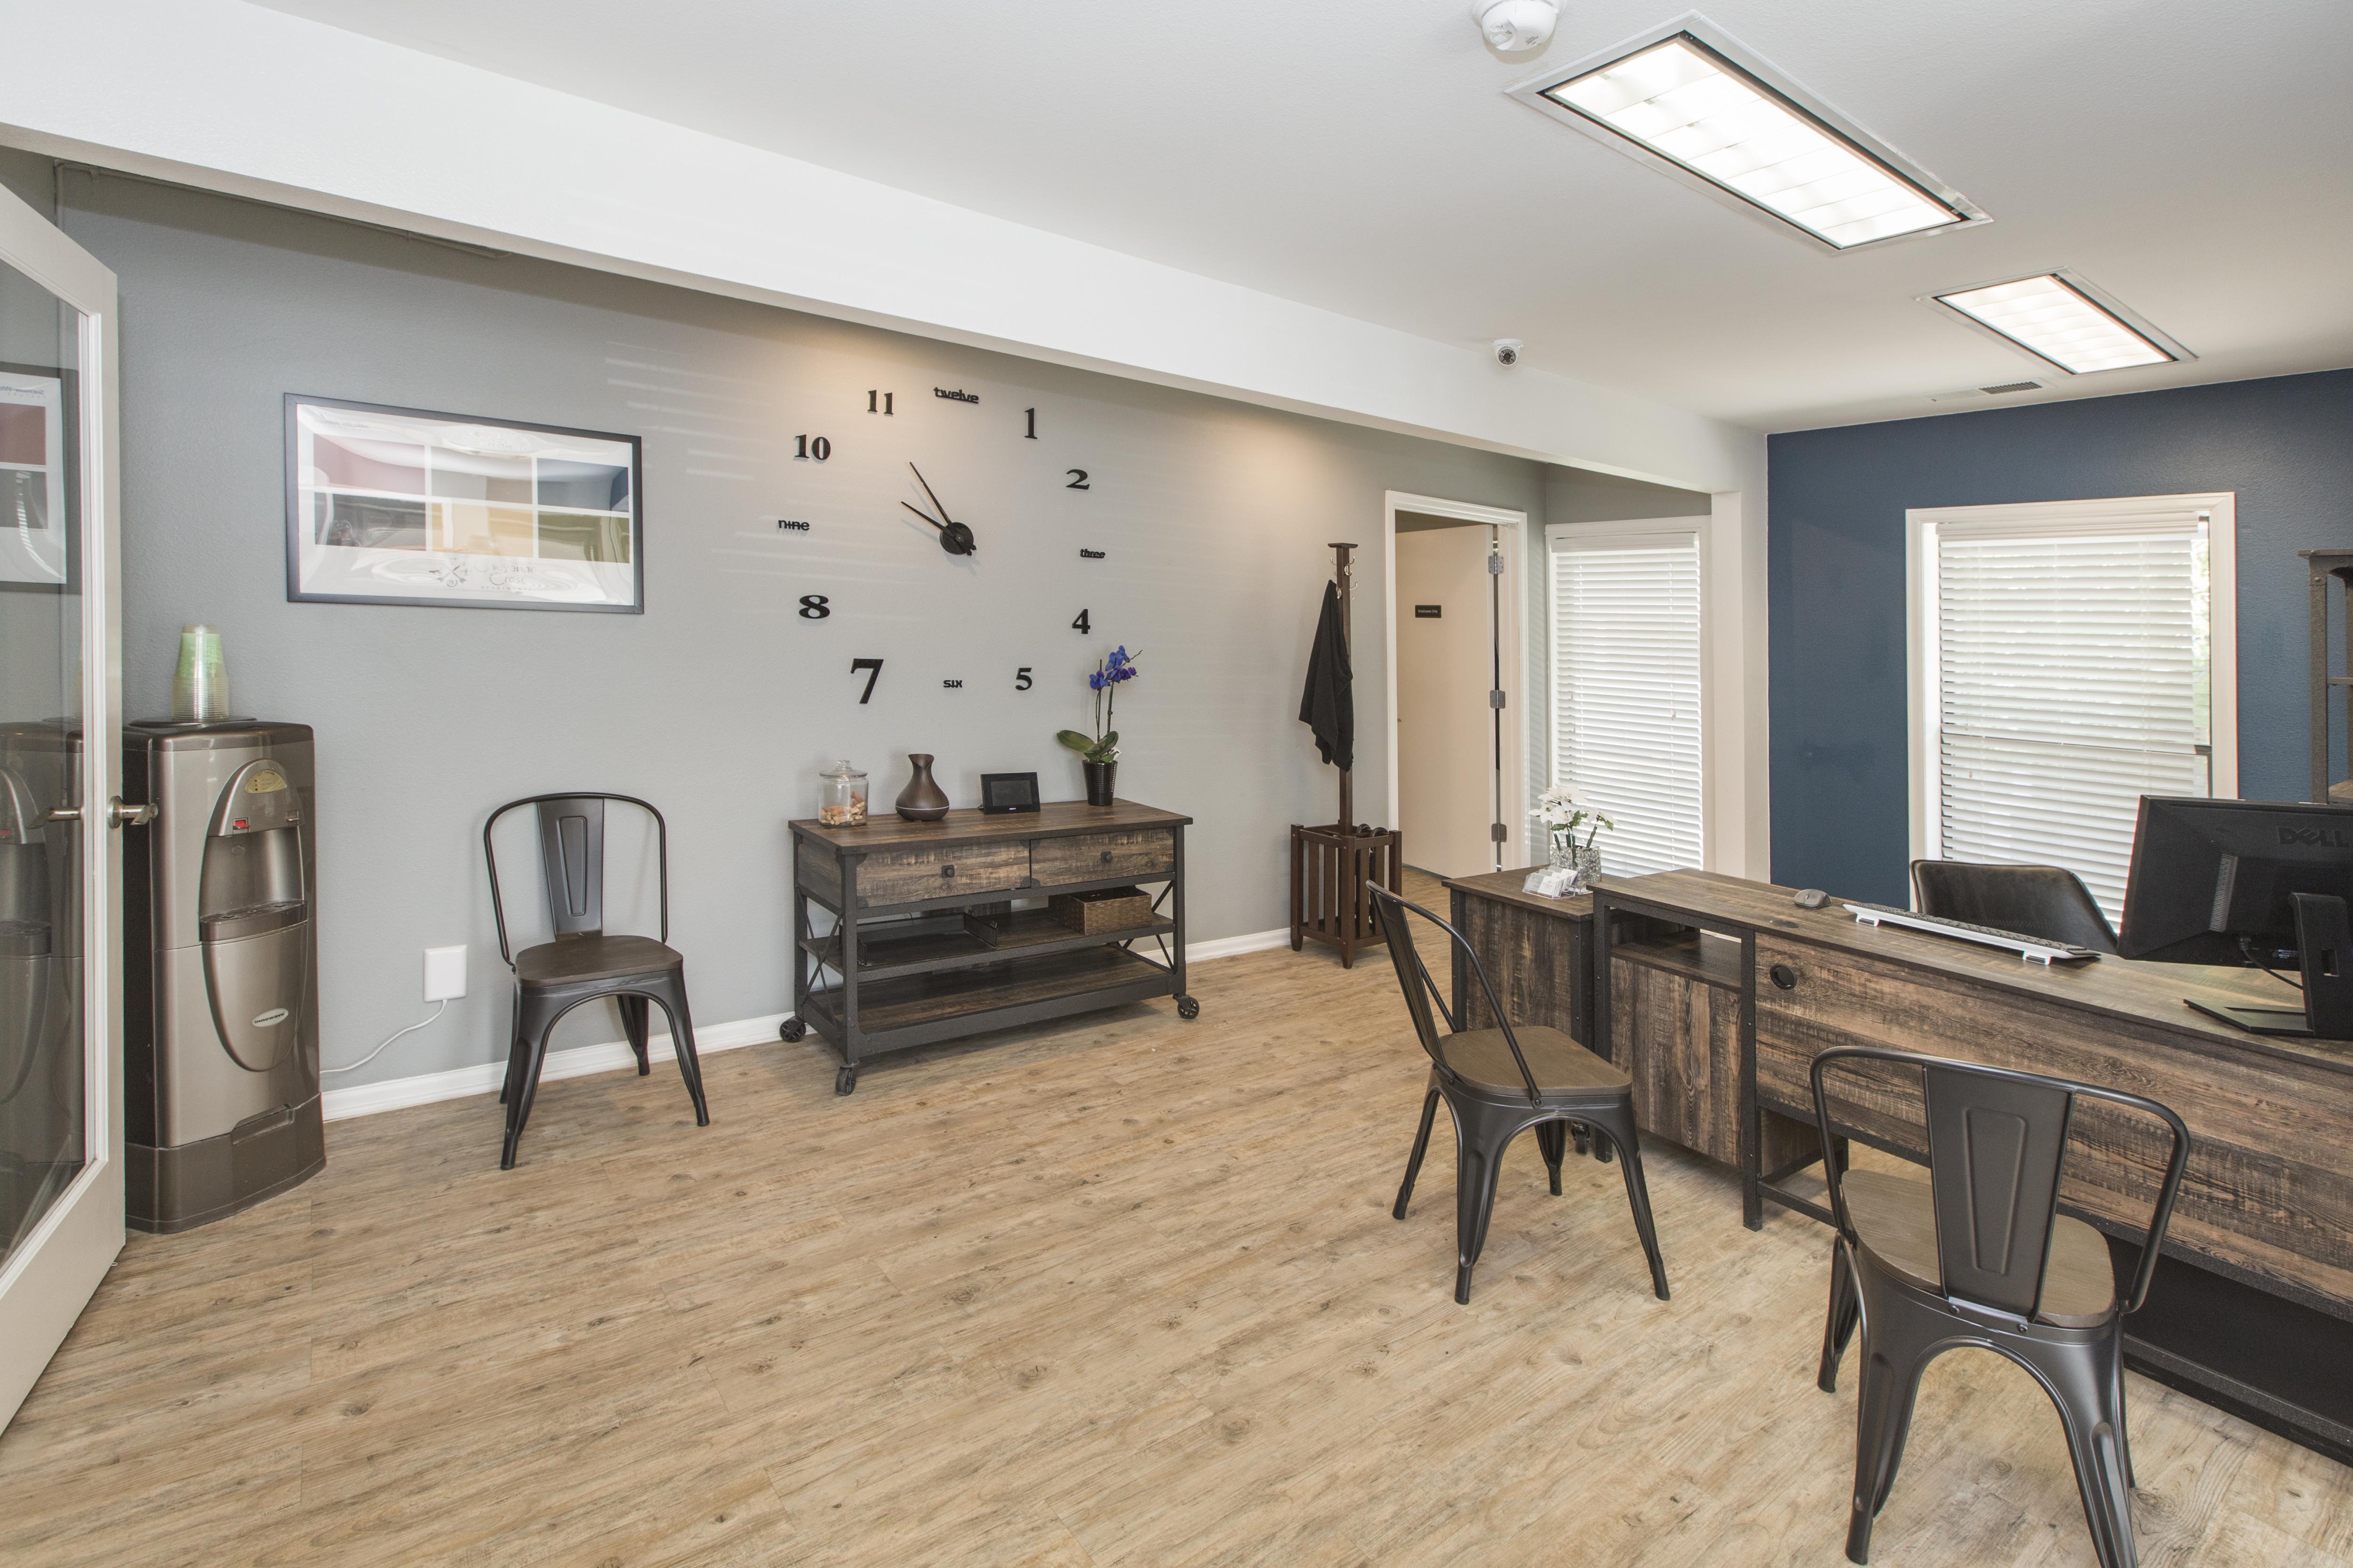 Cheyenne Crest Apartments rental